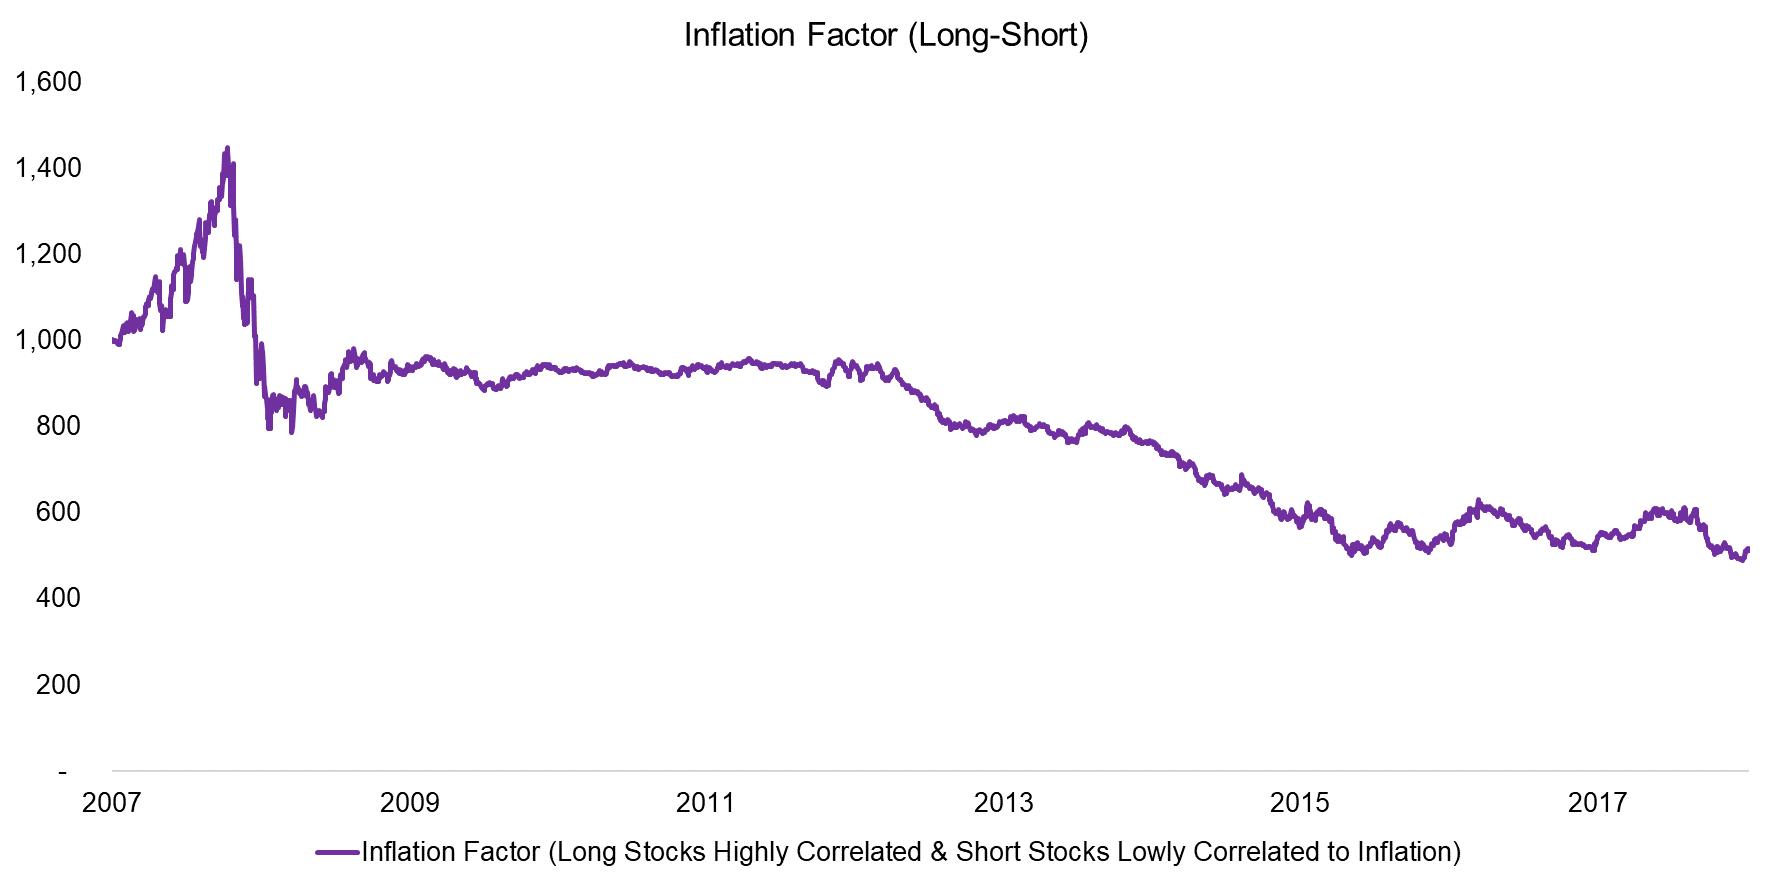 Inflation Factor (Long-Short)